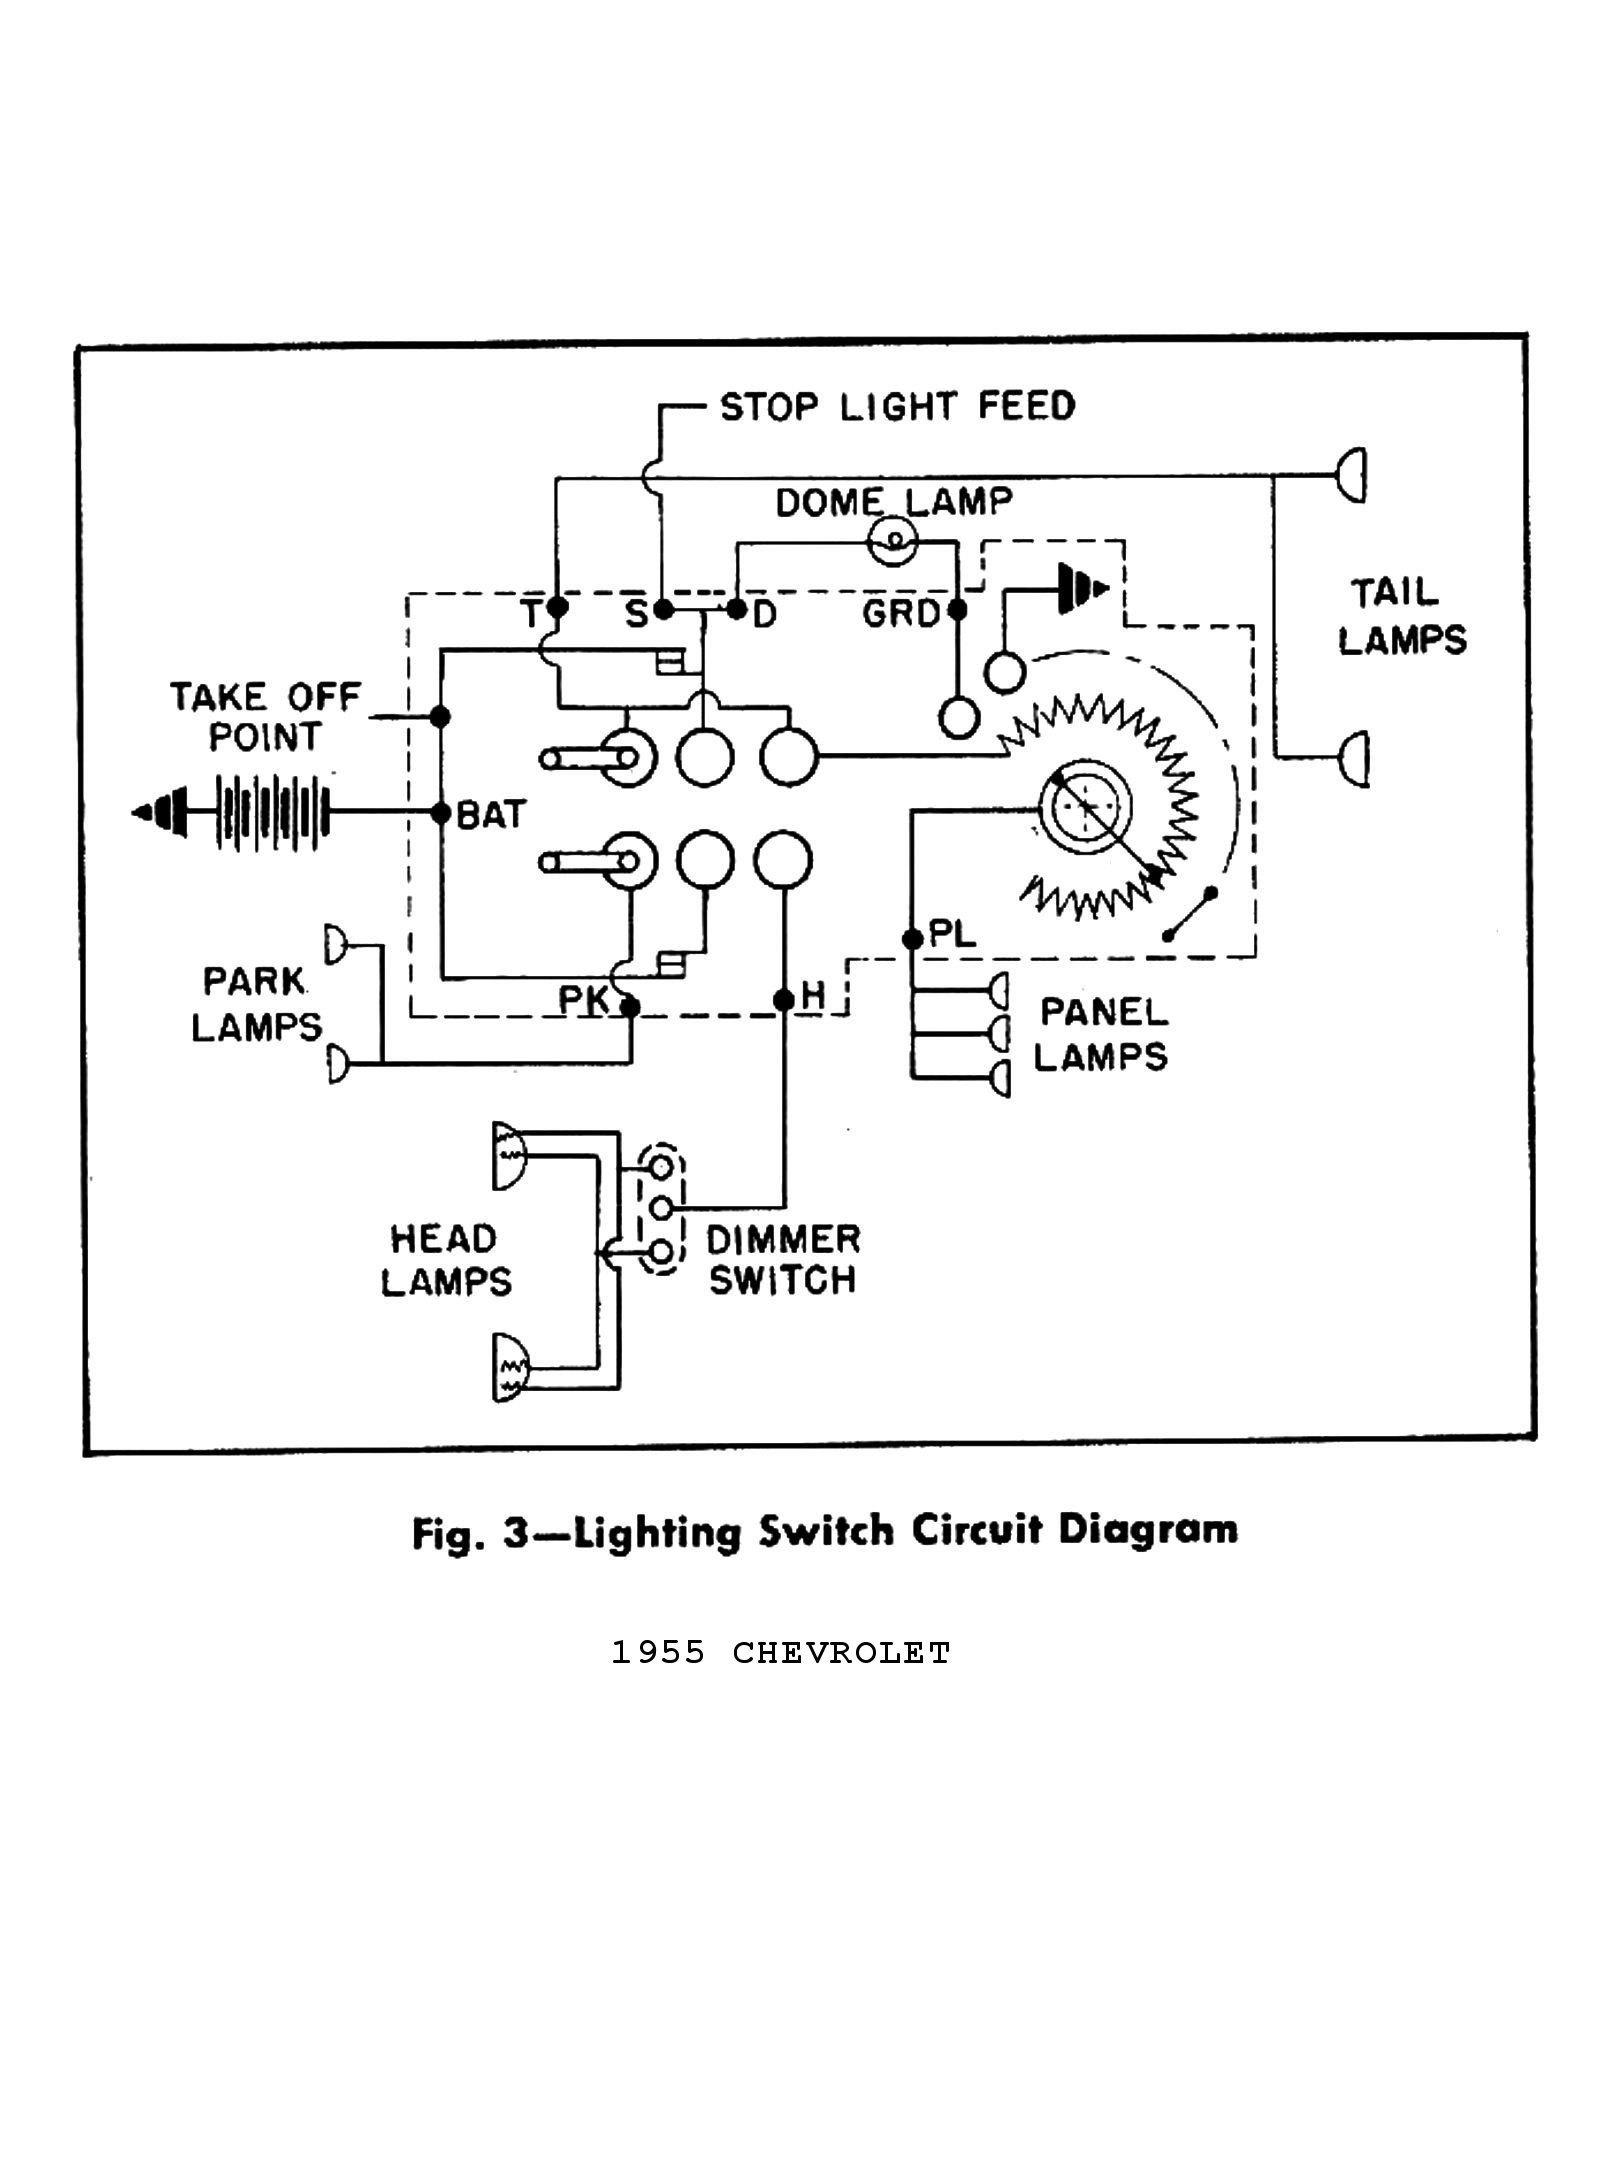 3 Position Pull Switch Wiring Diagram Electrical Diagrams Push Universal Headlight Illustration Of Crankshaft Sensor